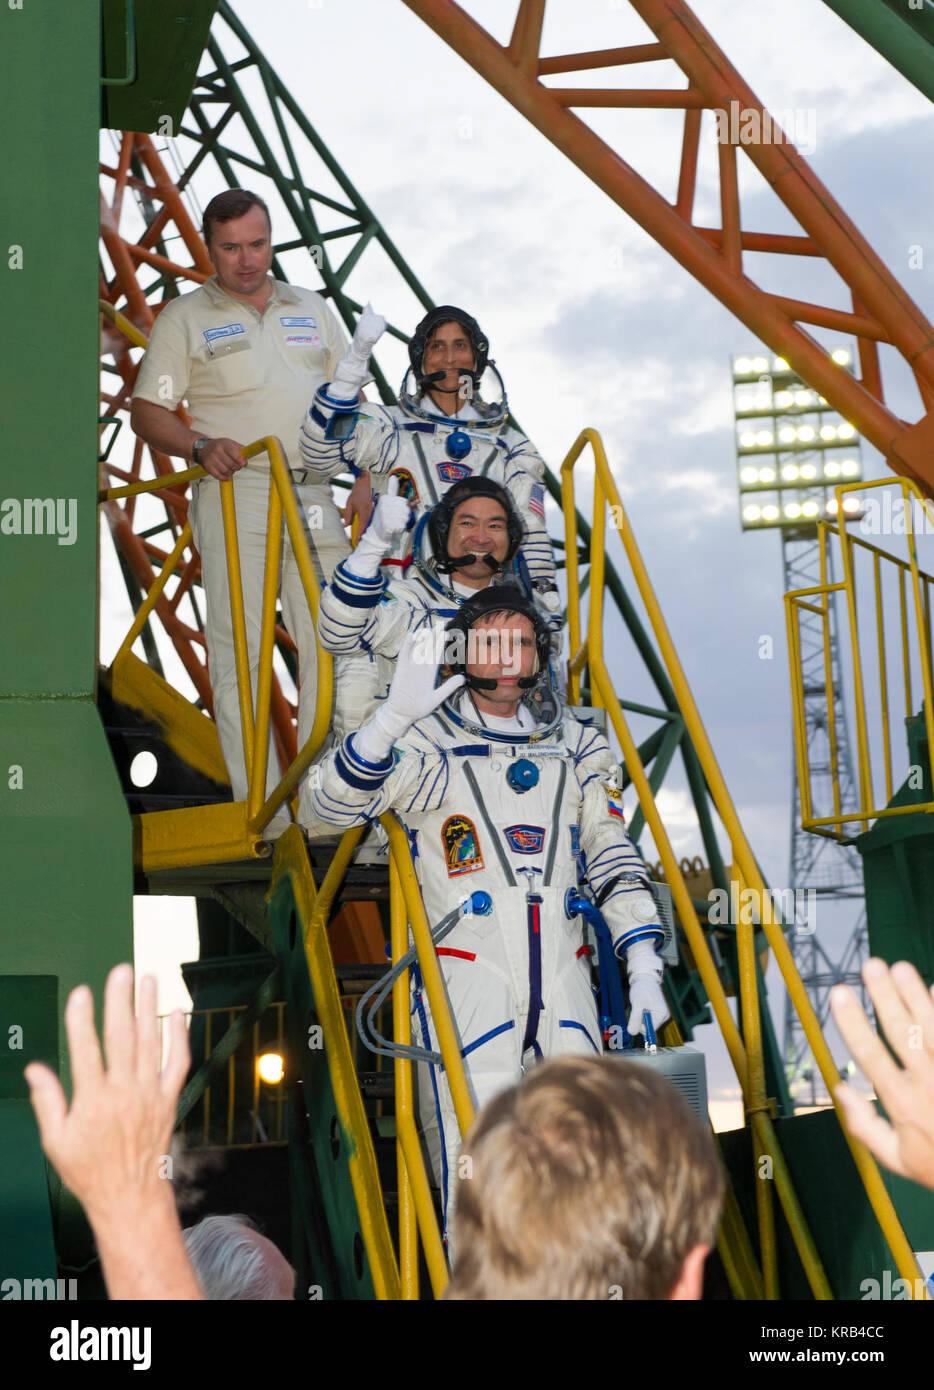 Expedition 32 Soyuz Commander Yuri Malenchenko, bottom, JAXA Flight Engineer Akihiko and NASA Flight Engineer Sunita - Stock Image